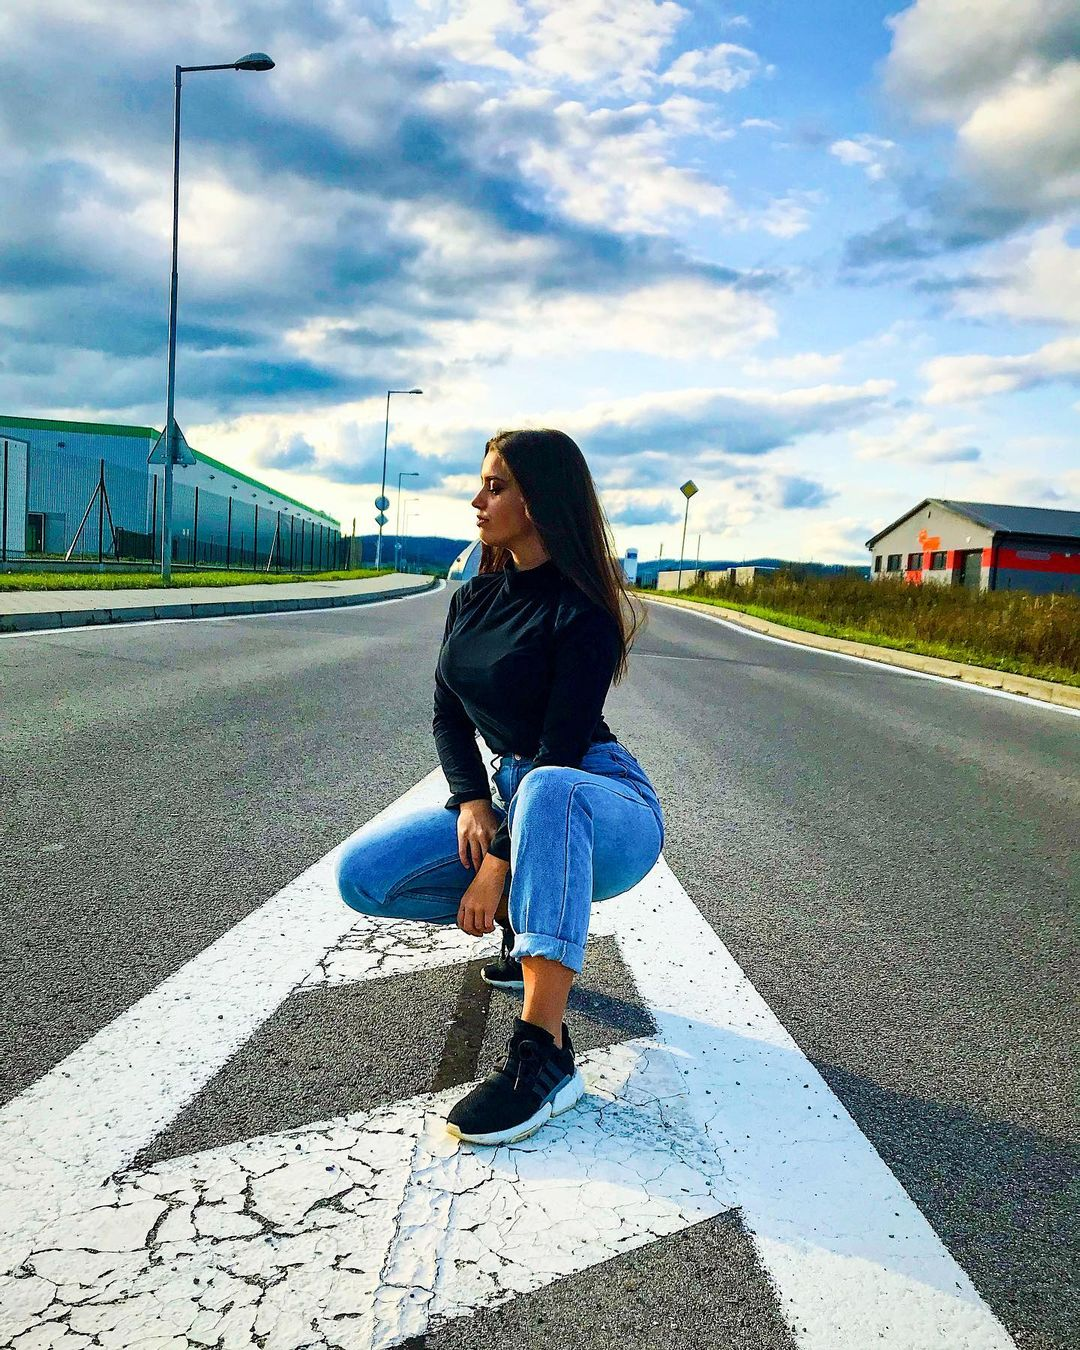 Laurencikova-Laura-Wallpapers-Insta-Fit-Bio-Laura-Laurencikova-Wallpapers-Insta-Fit-Bio-5